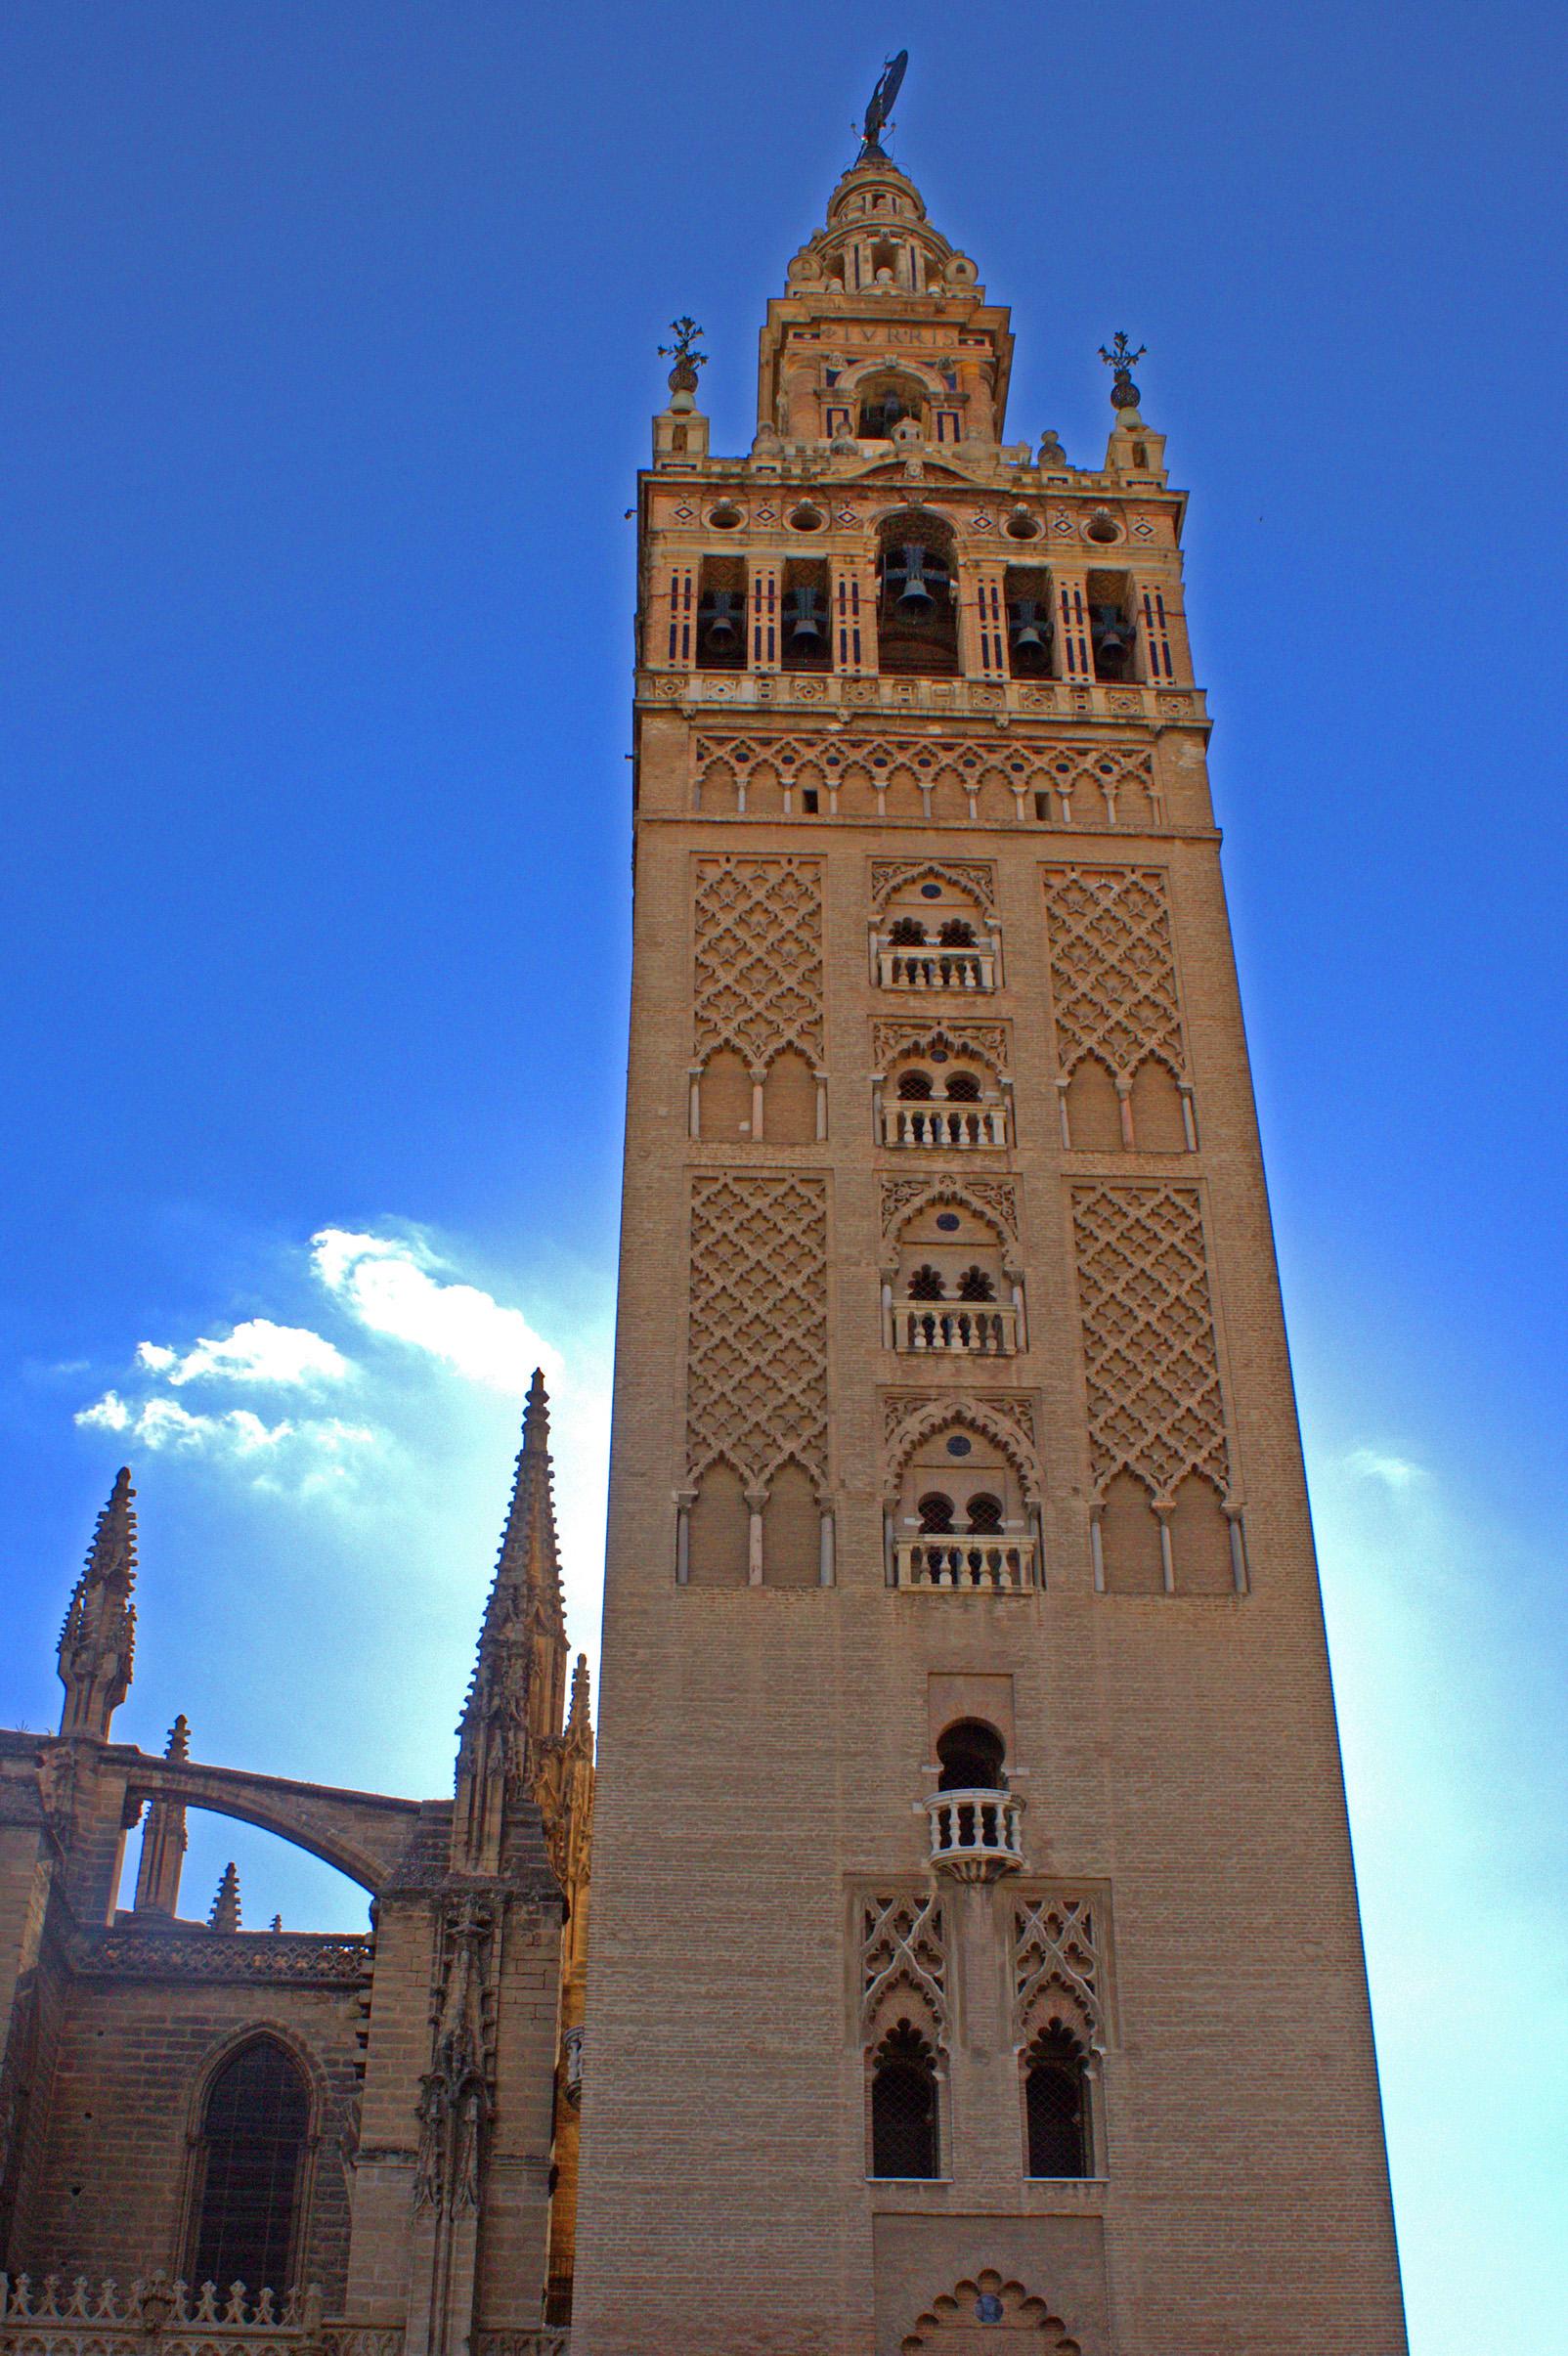 La giralda tower in seville, spain photo